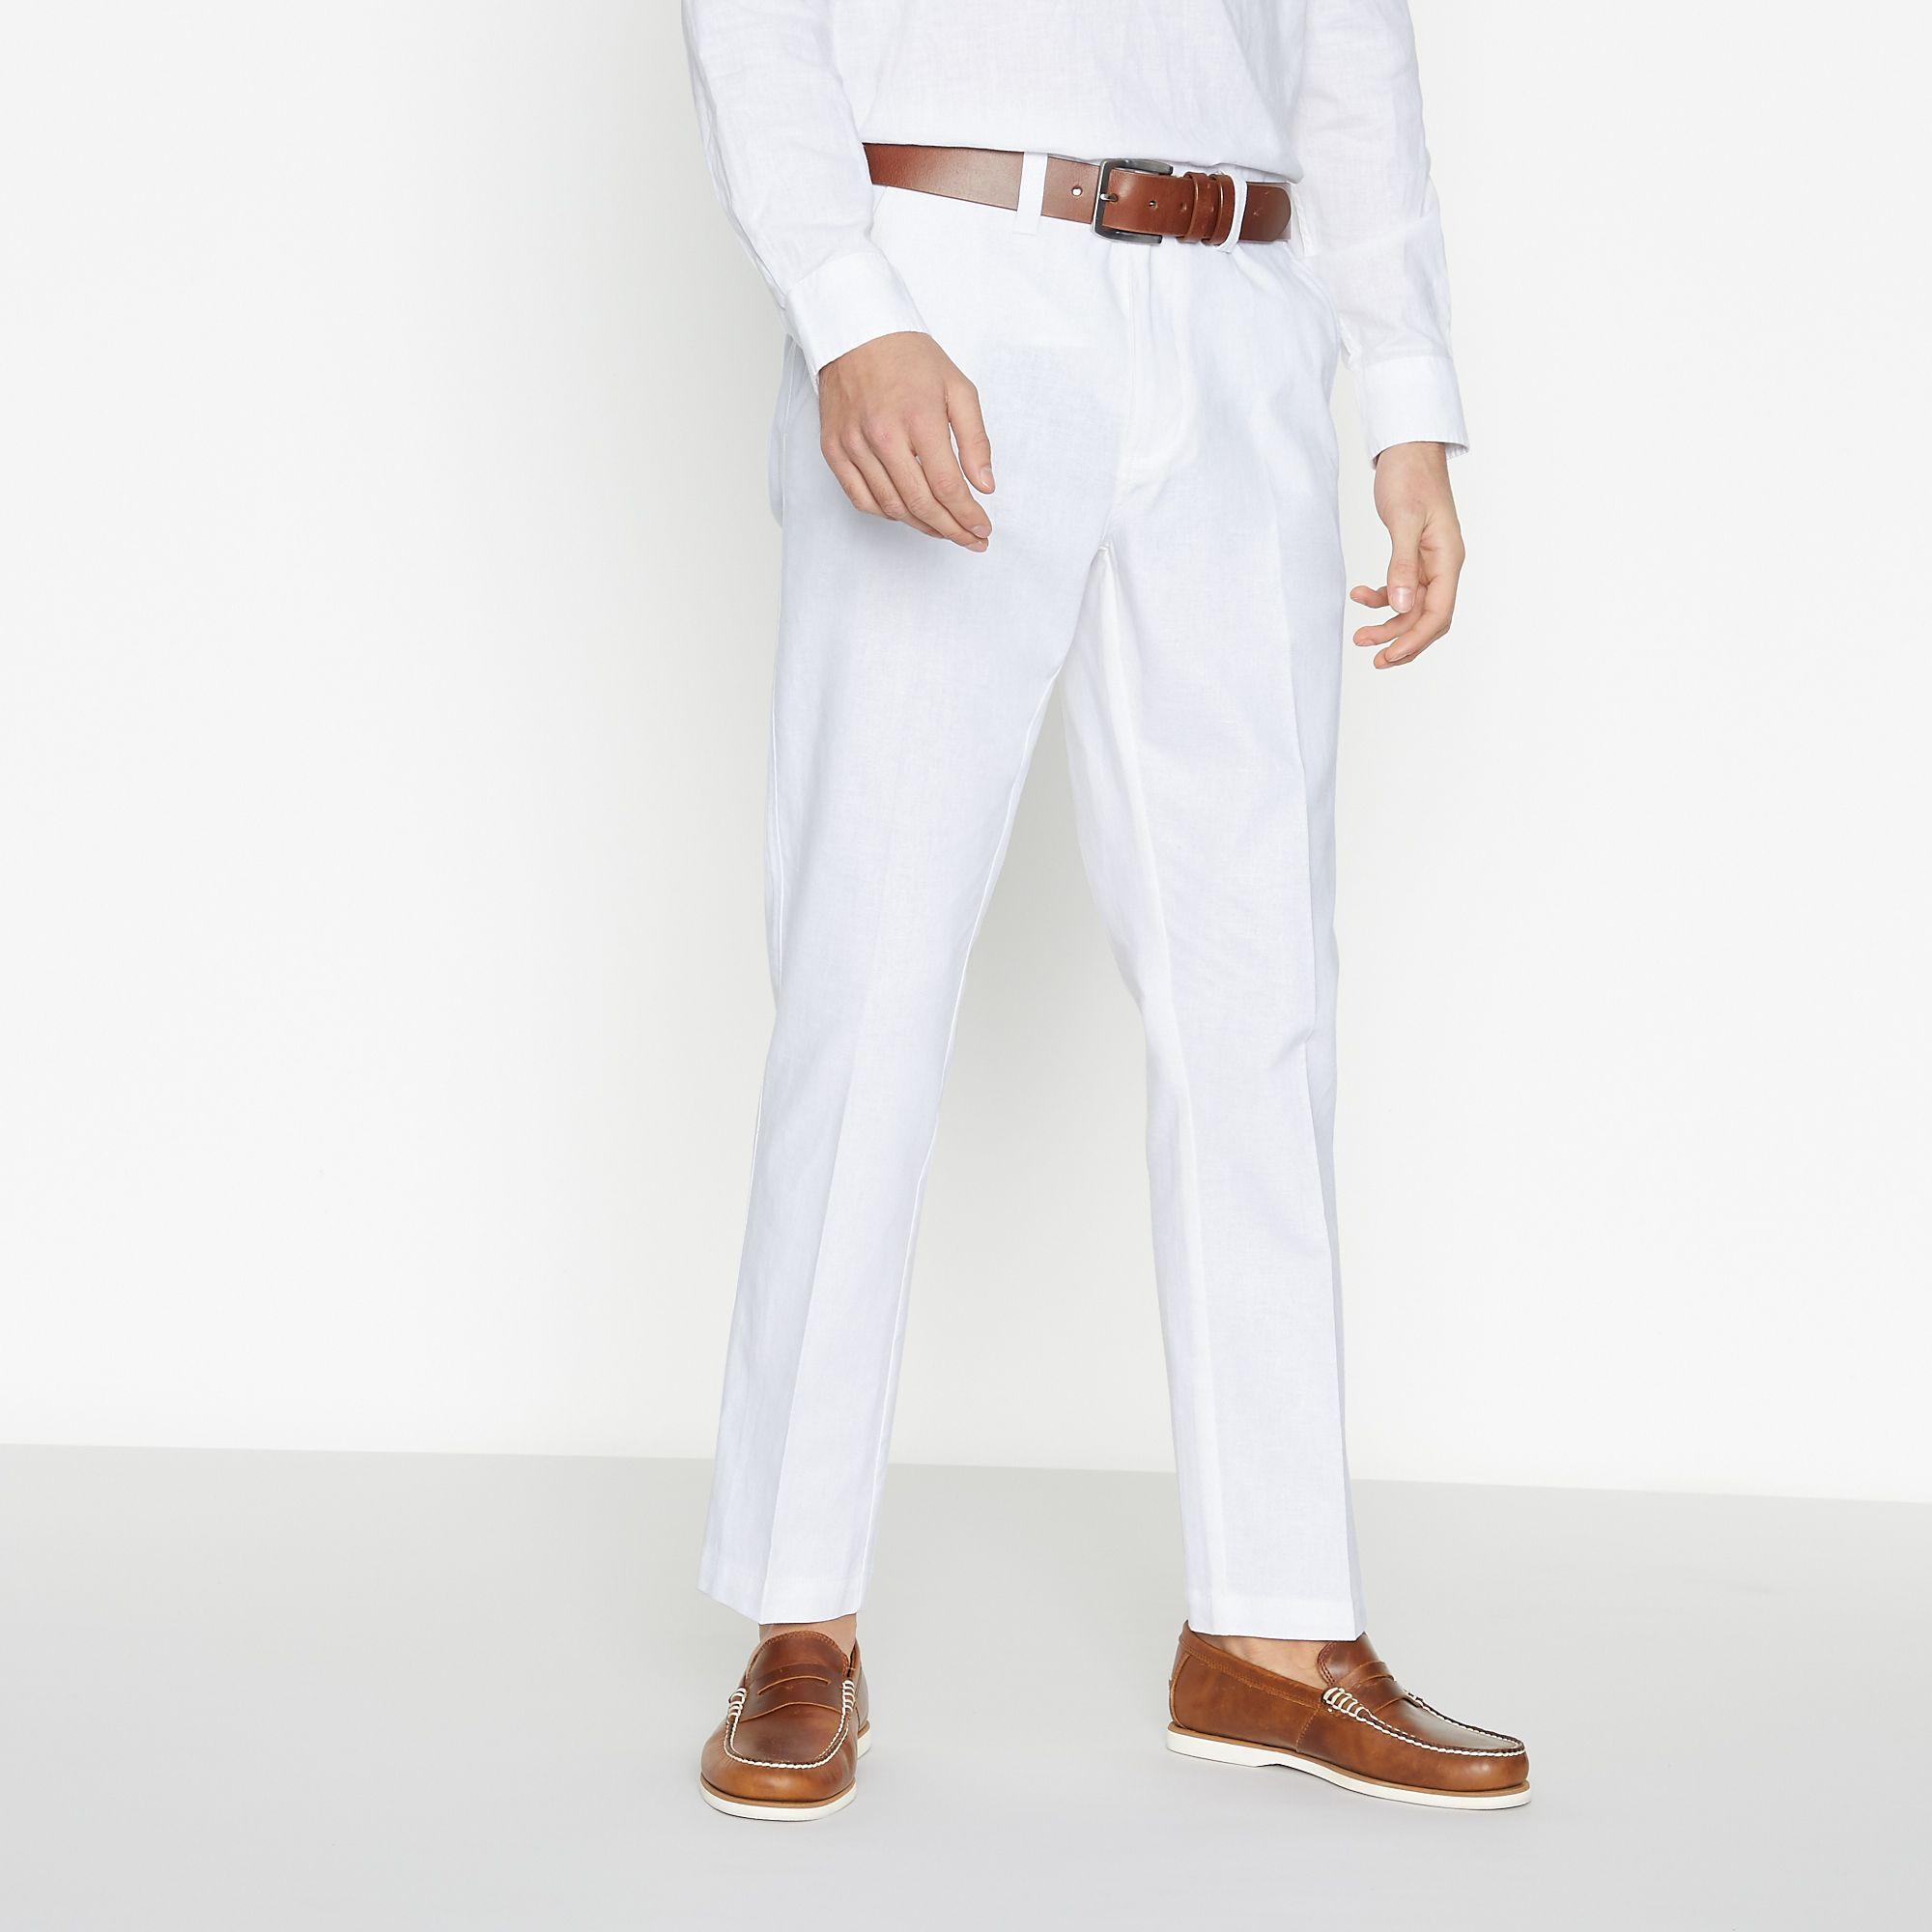 c17b9e5606 Details about Maine New England Men White Linen Blend Trousers